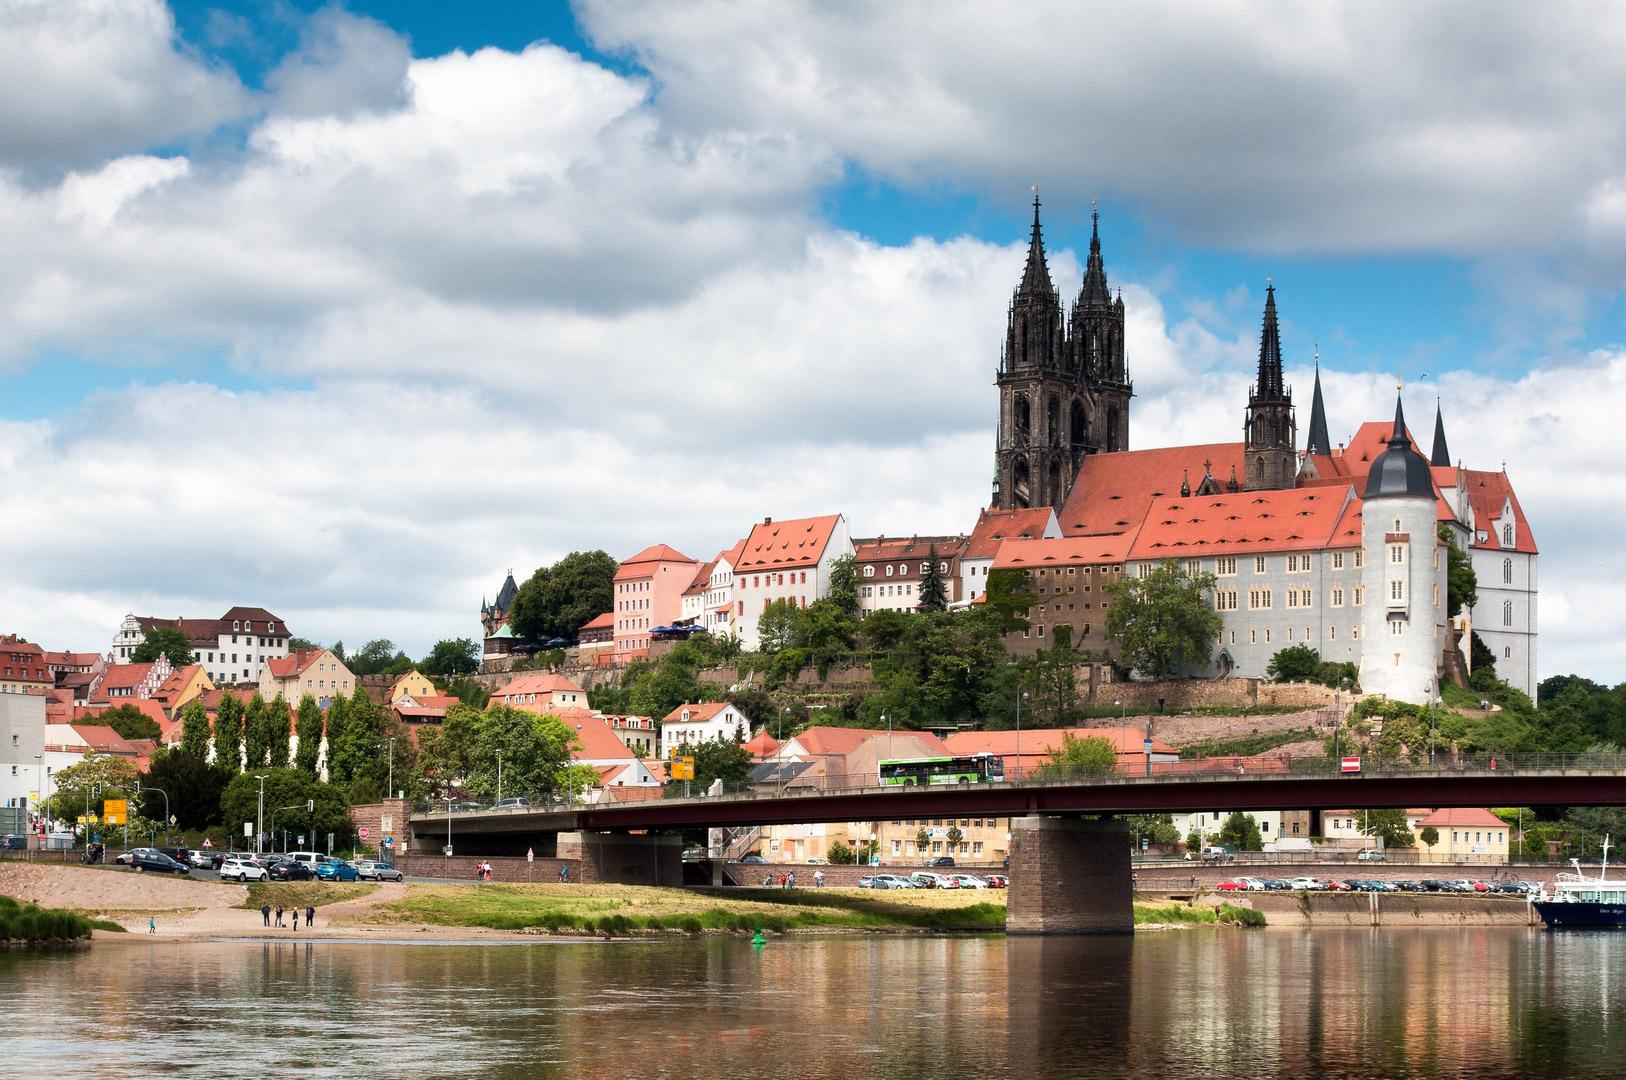 De mooiste steden in Saksen - Meissen